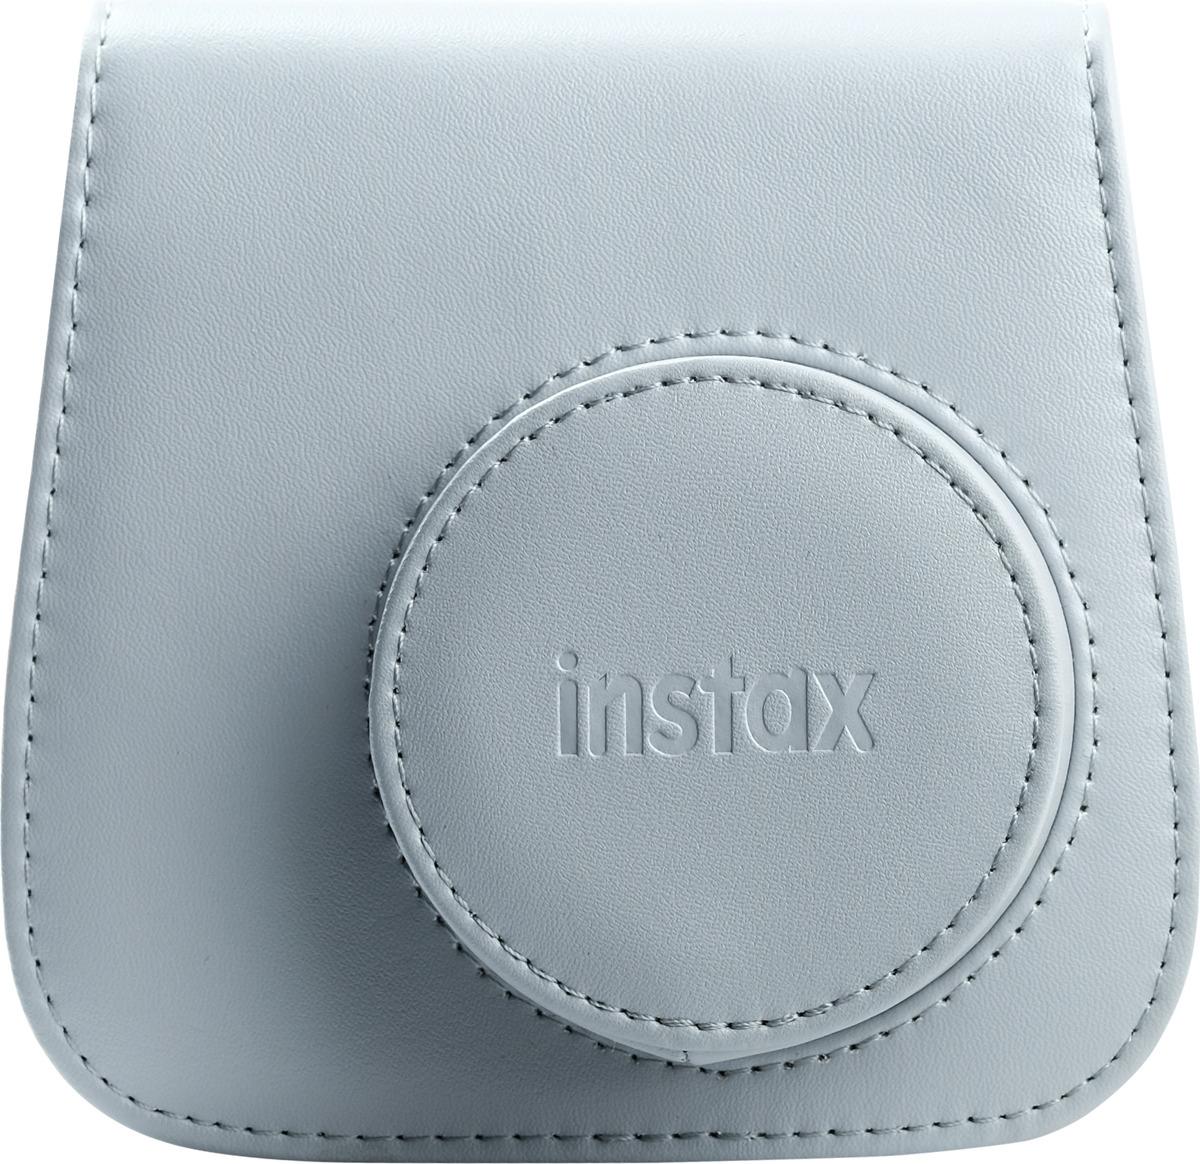 Чехол для камеры Fujifilm Instax Mini 9 Case, светло-серый